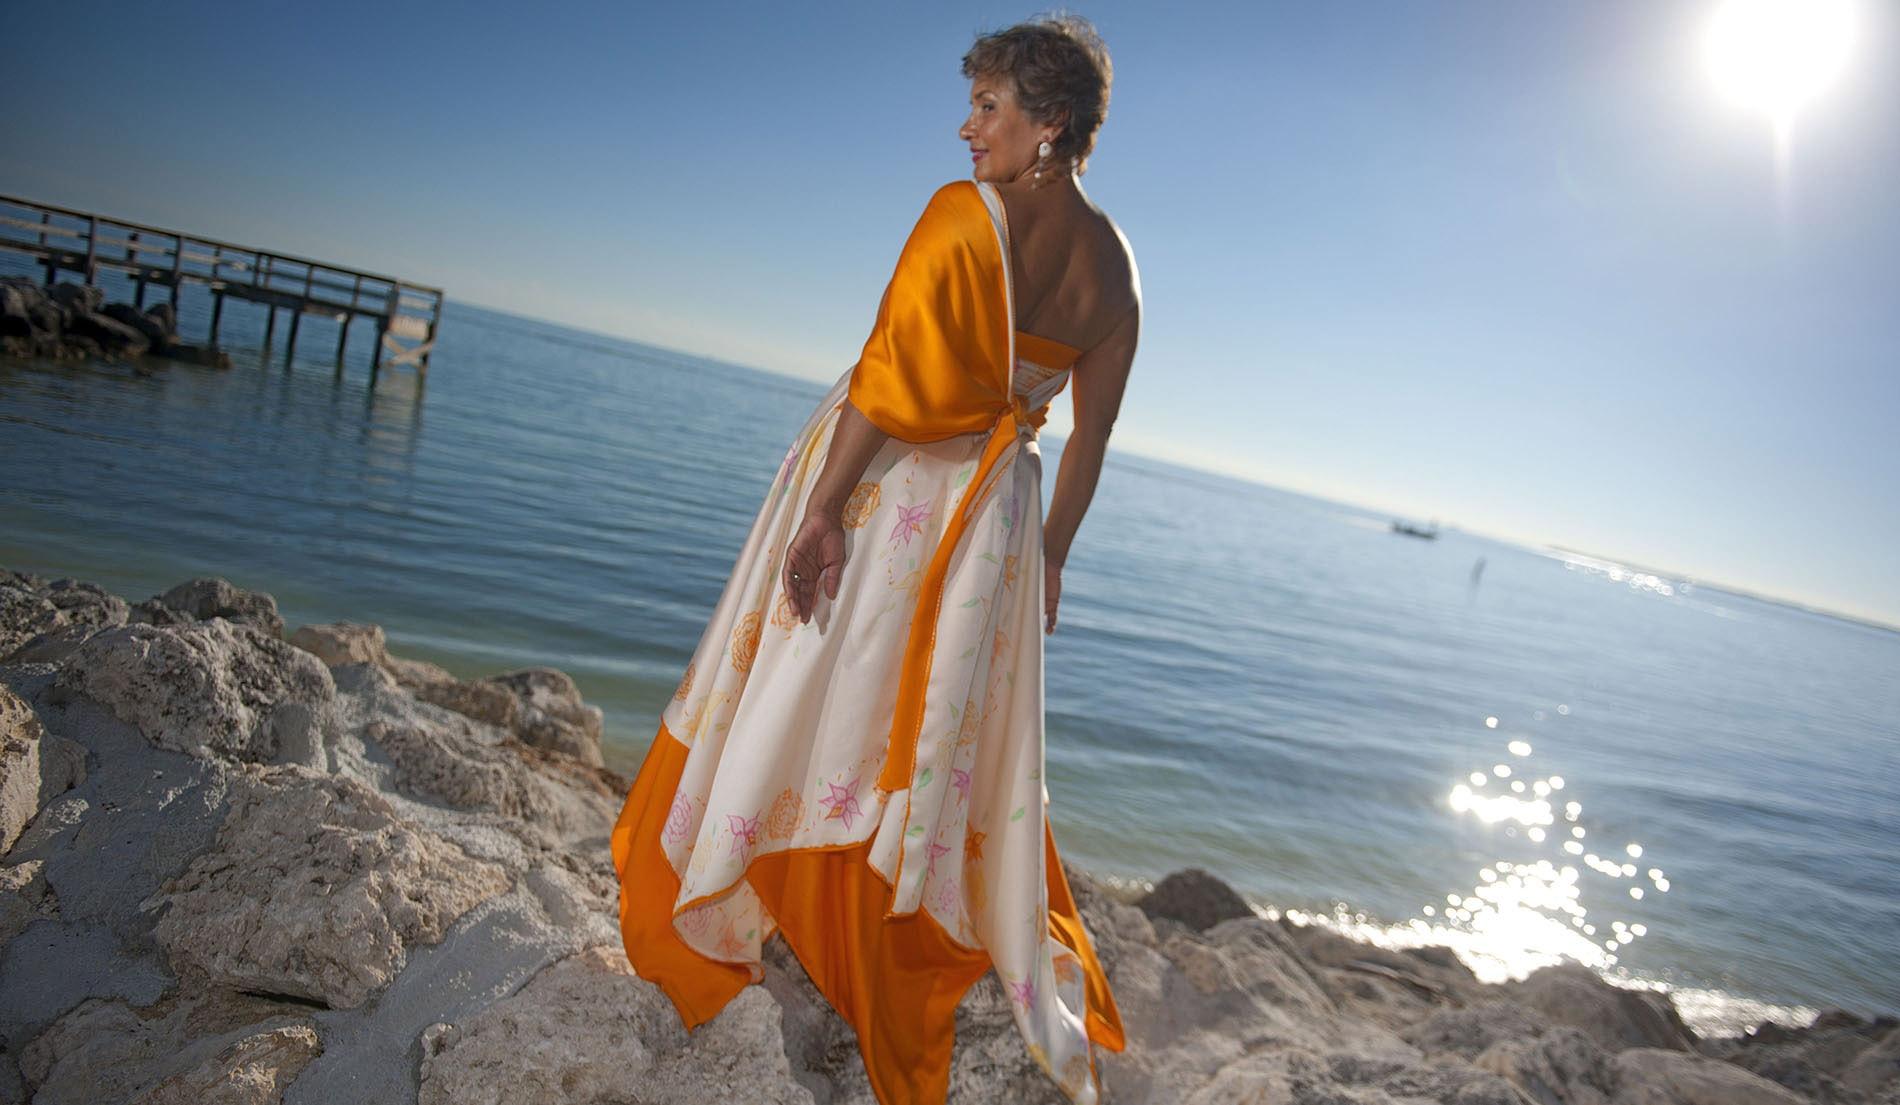 Asymmetric Beach Inspired Weeding Dresses - look 8 back